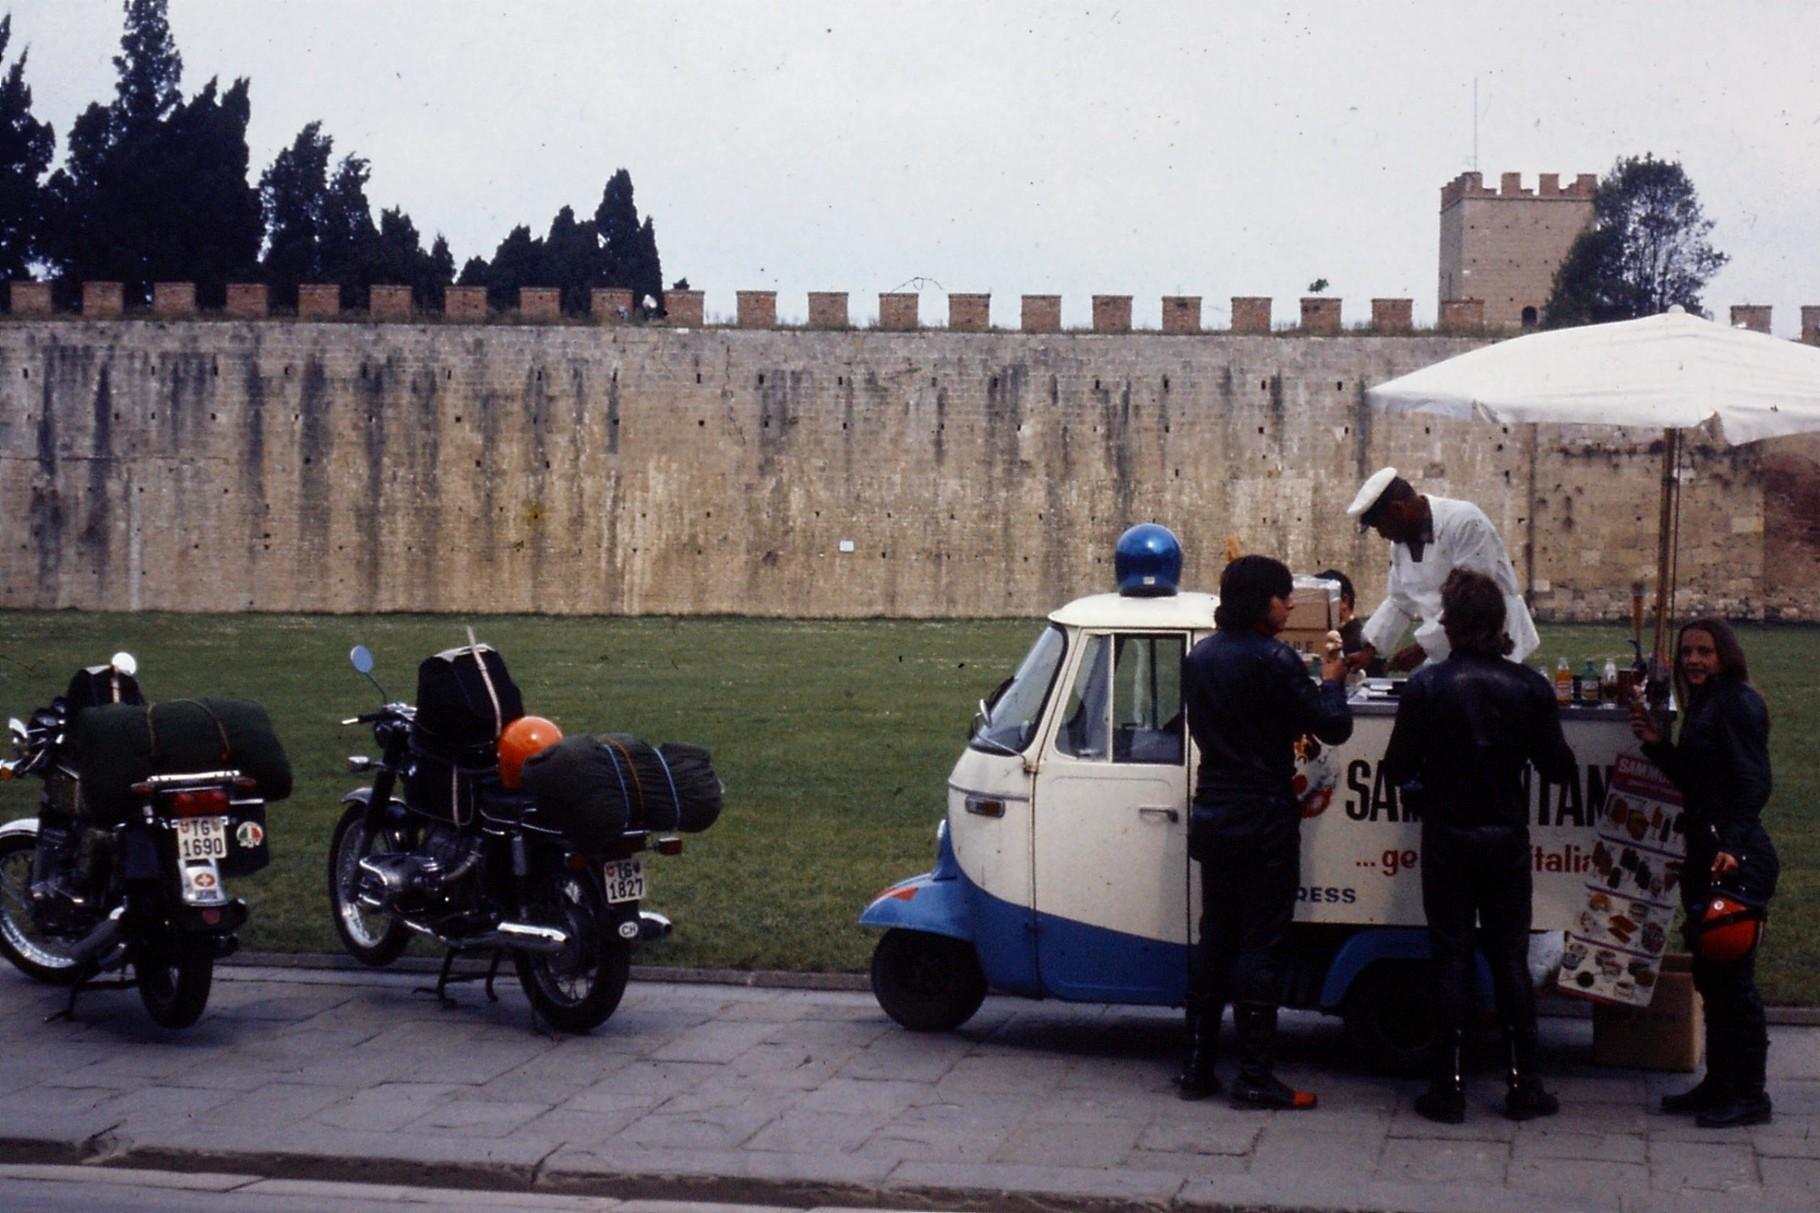 Glace Essen in Pisa